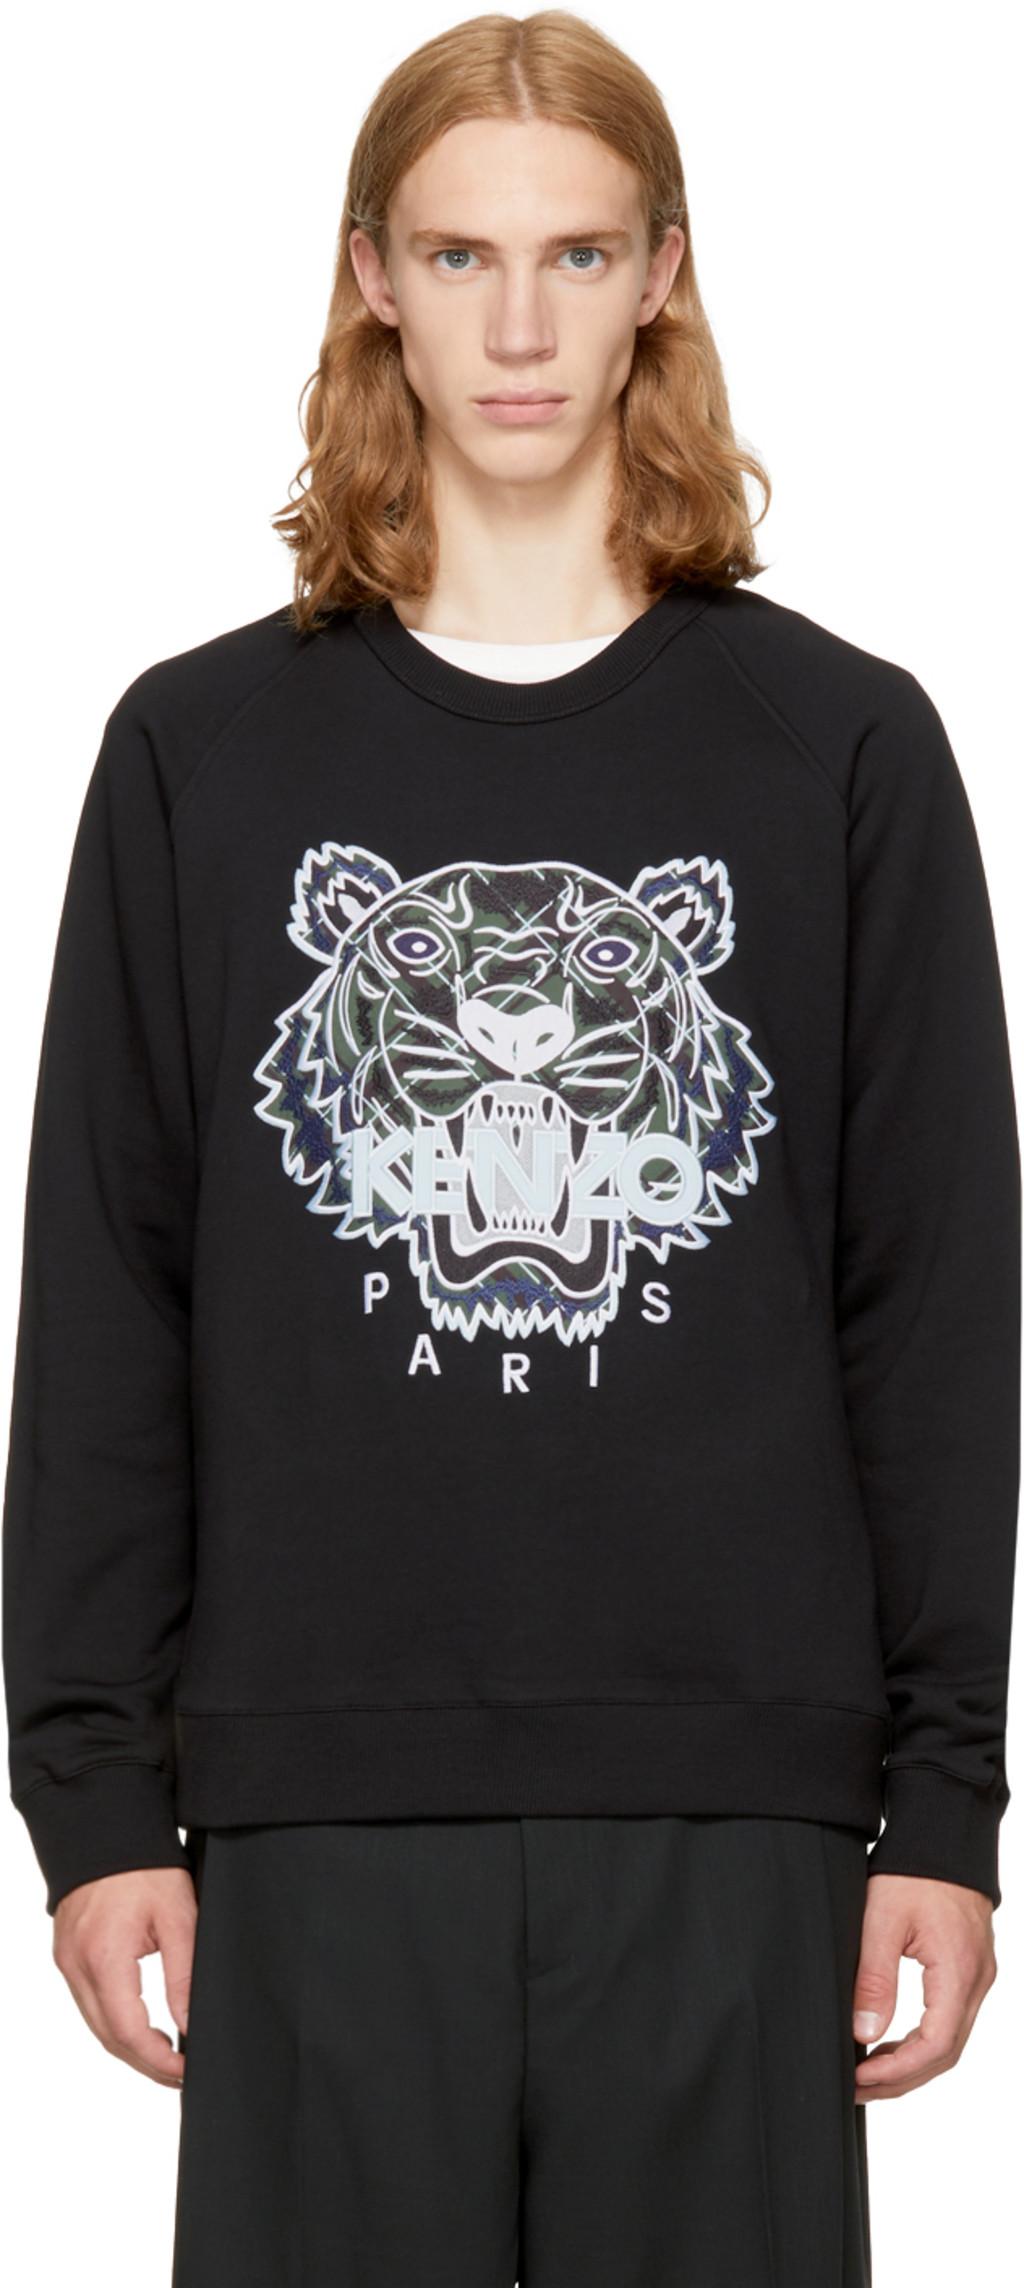 Black t shirt hoodie - Black T Shirt Hoodie 44